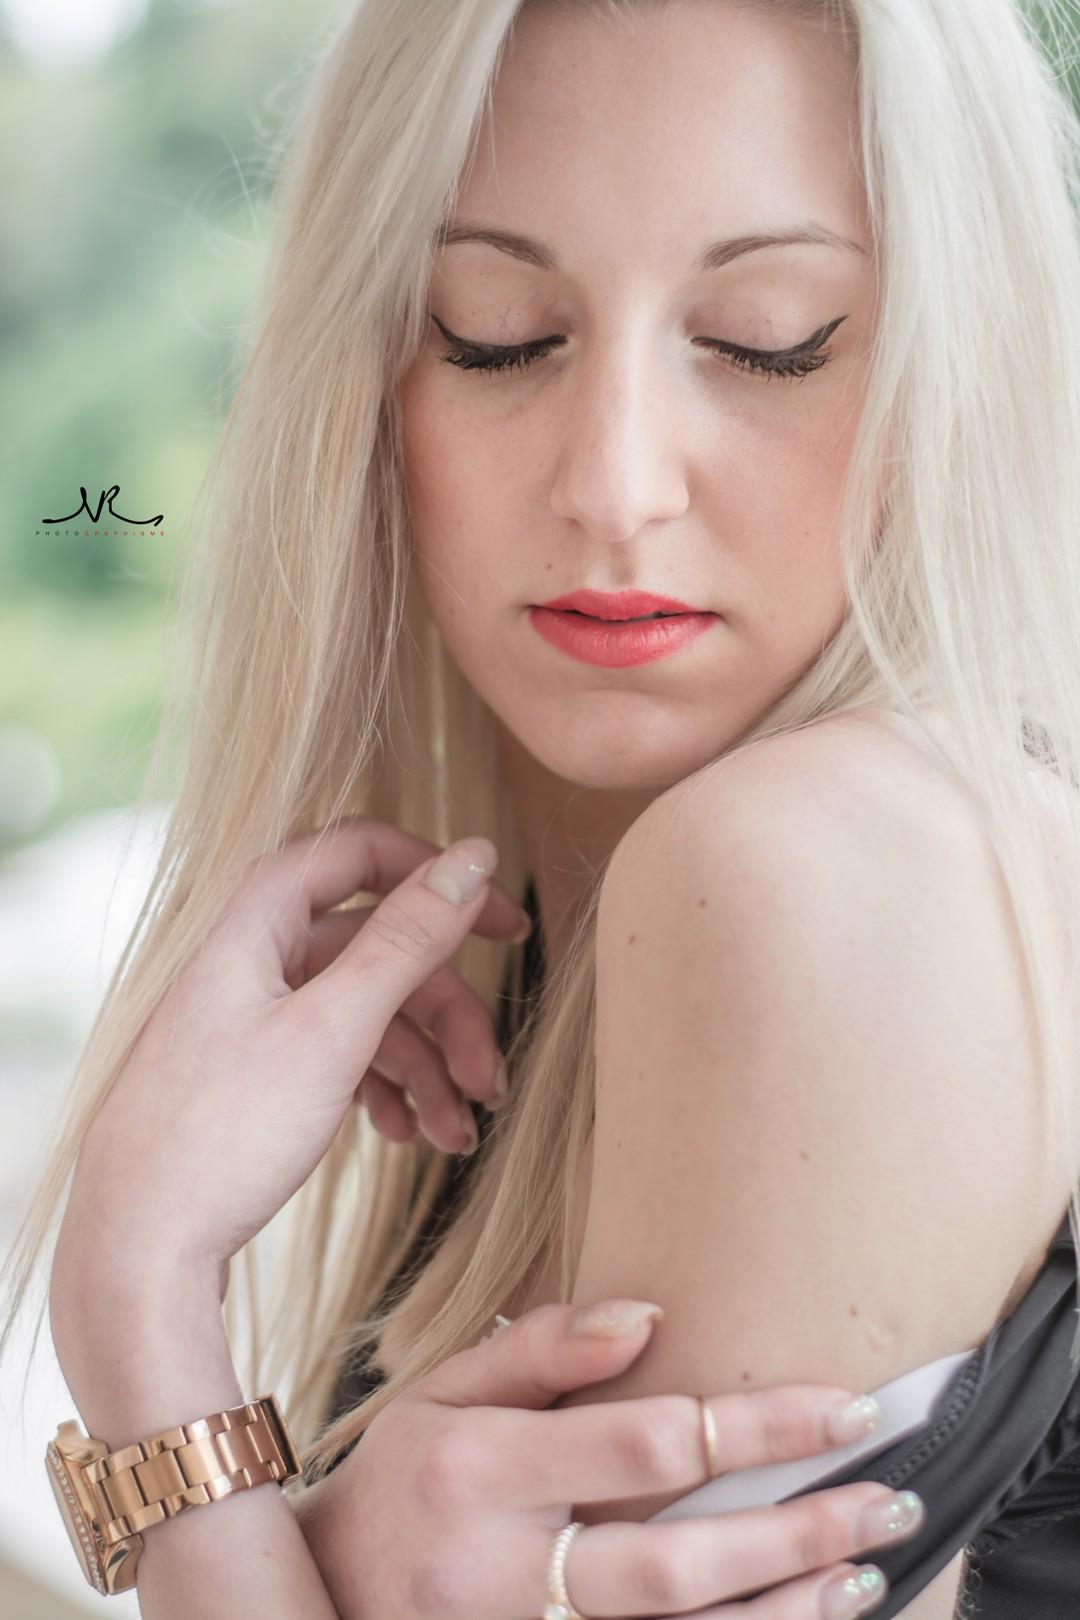 Justine niary randria nr nrandria photographe Epinal photography shooting epinal 88 vosges chantraine mode modèle